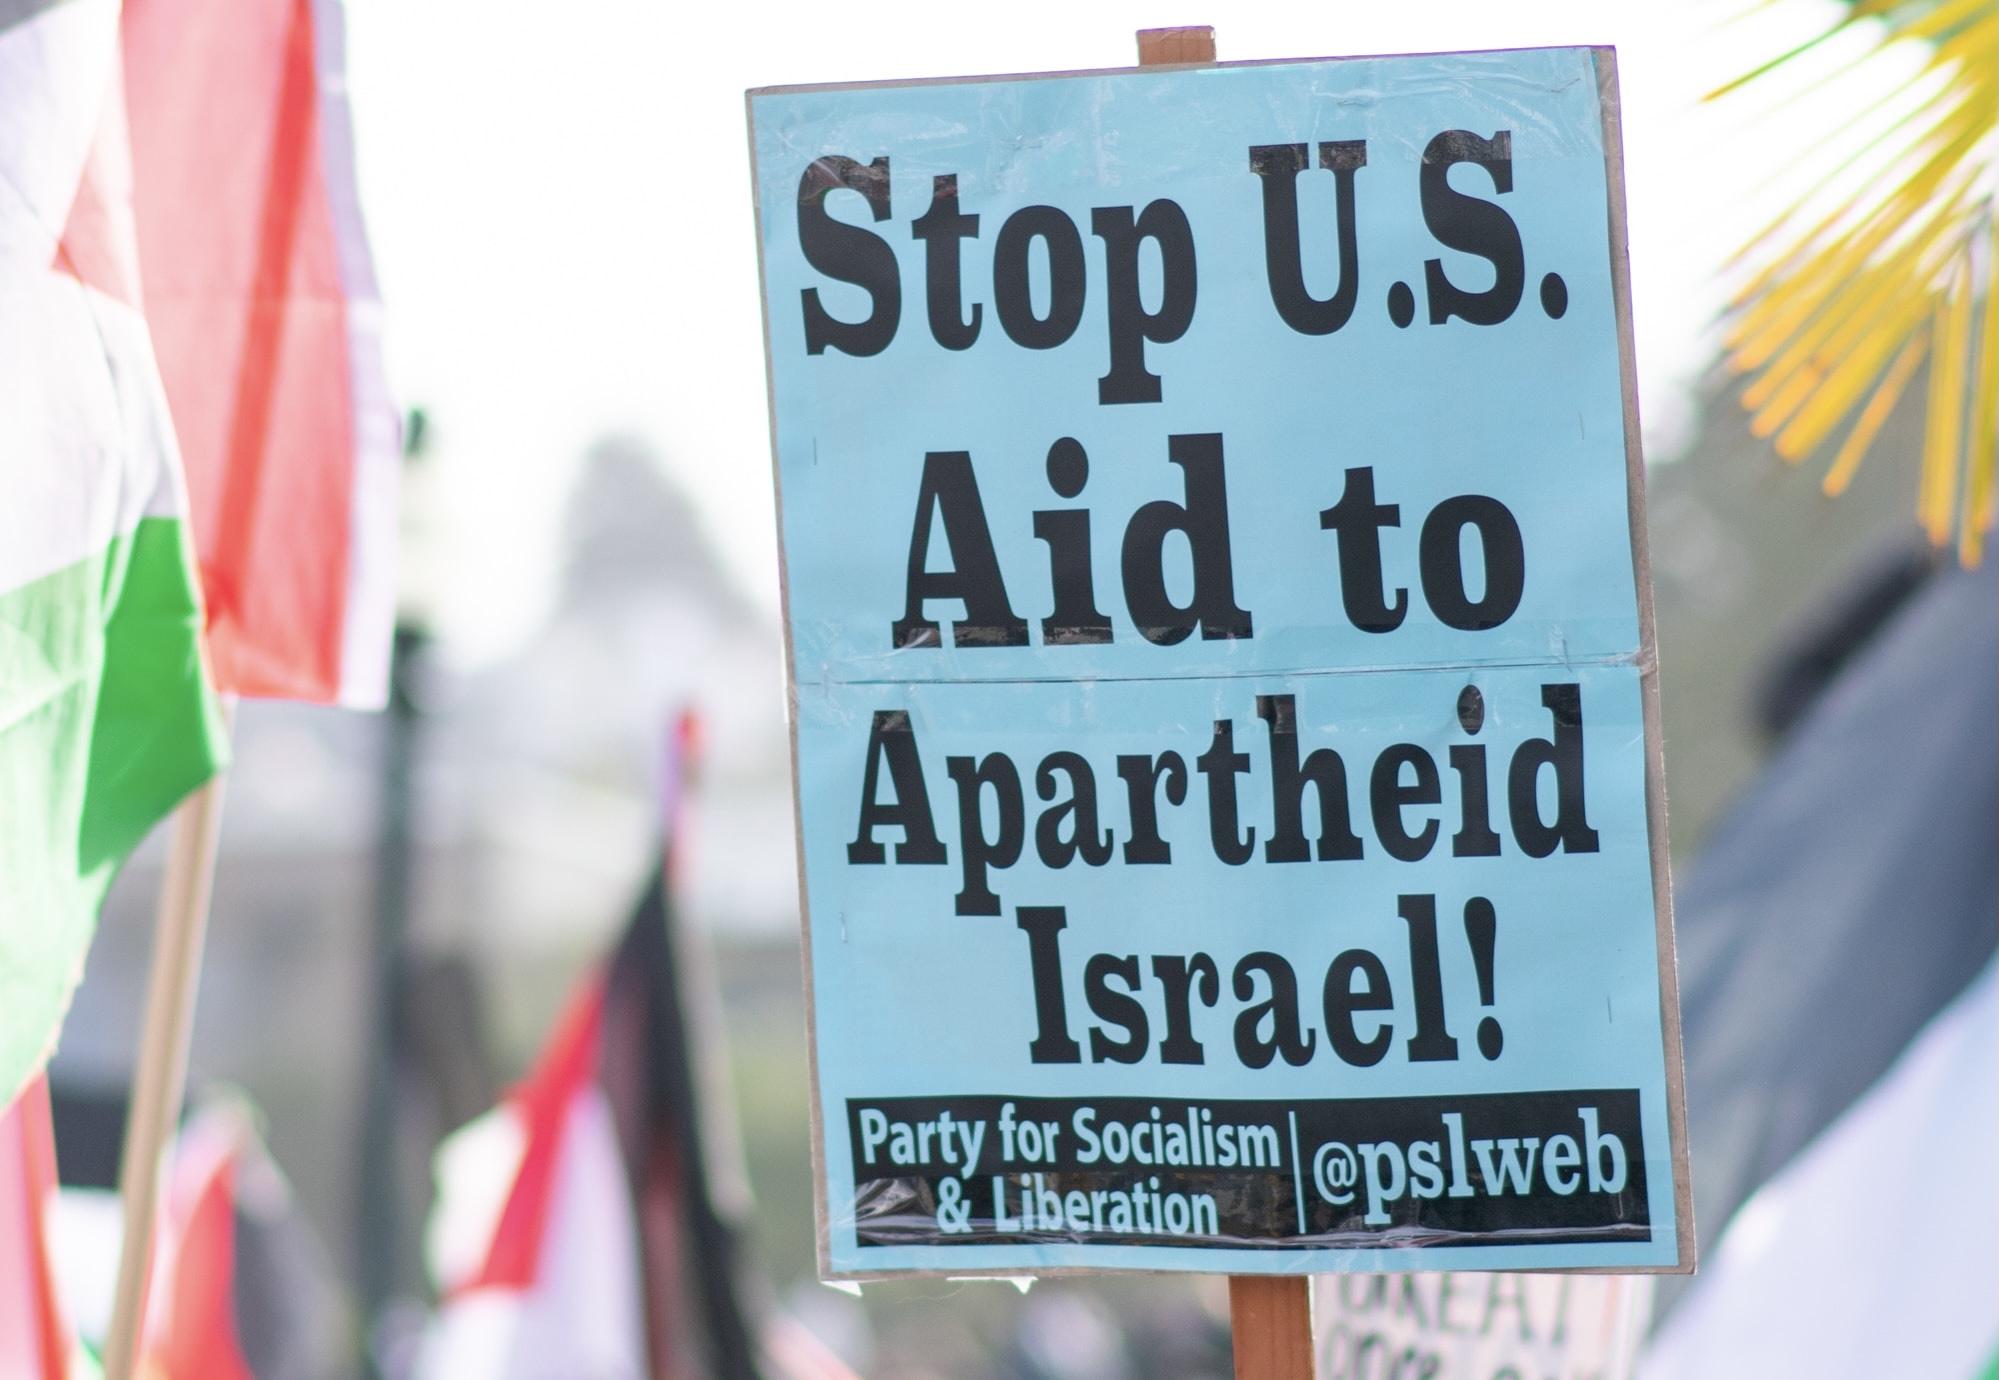 Us aid to Israel